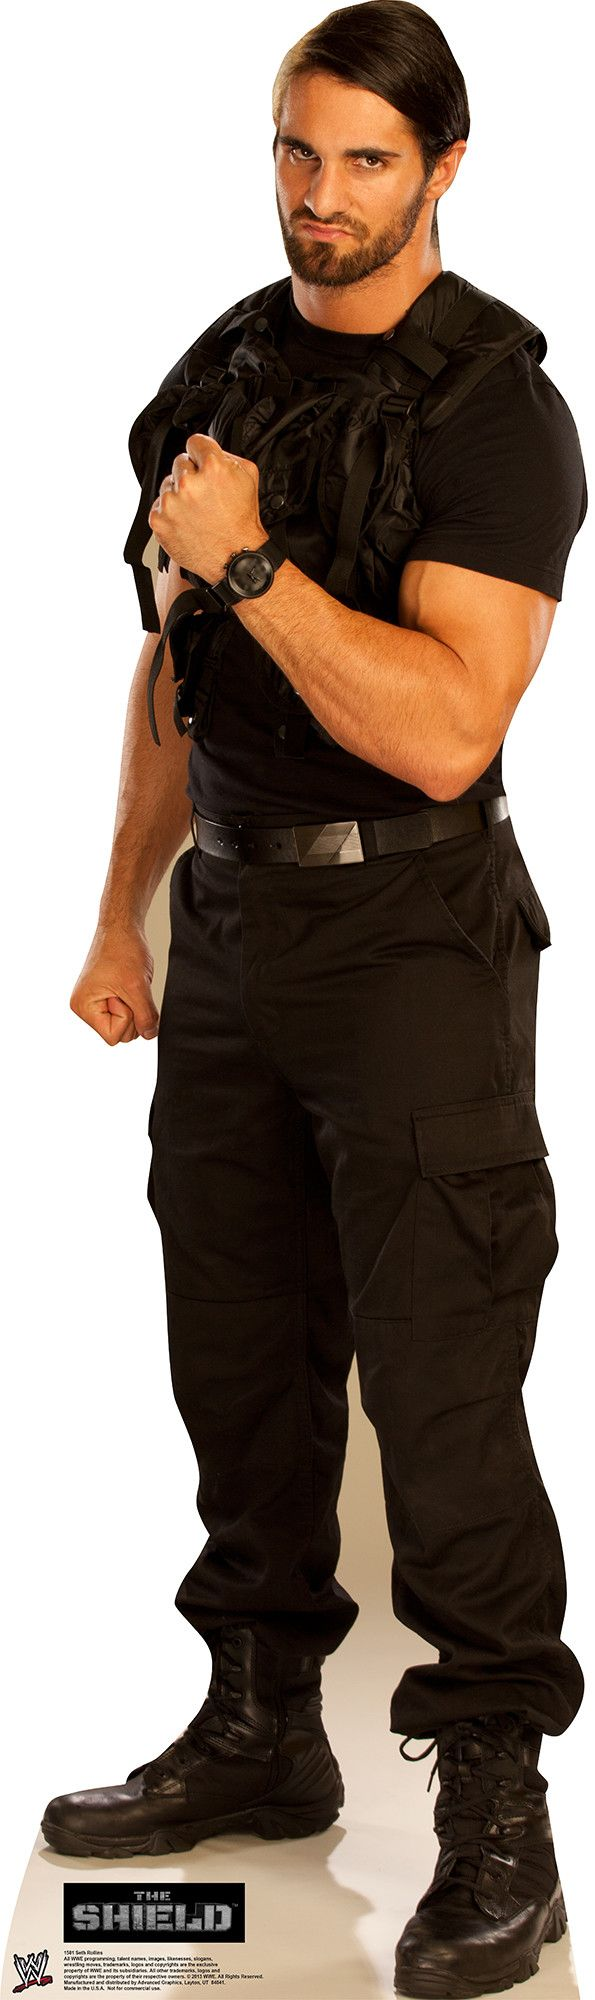 124 best wwe hunks images on pinterest wwe wrestlers seth